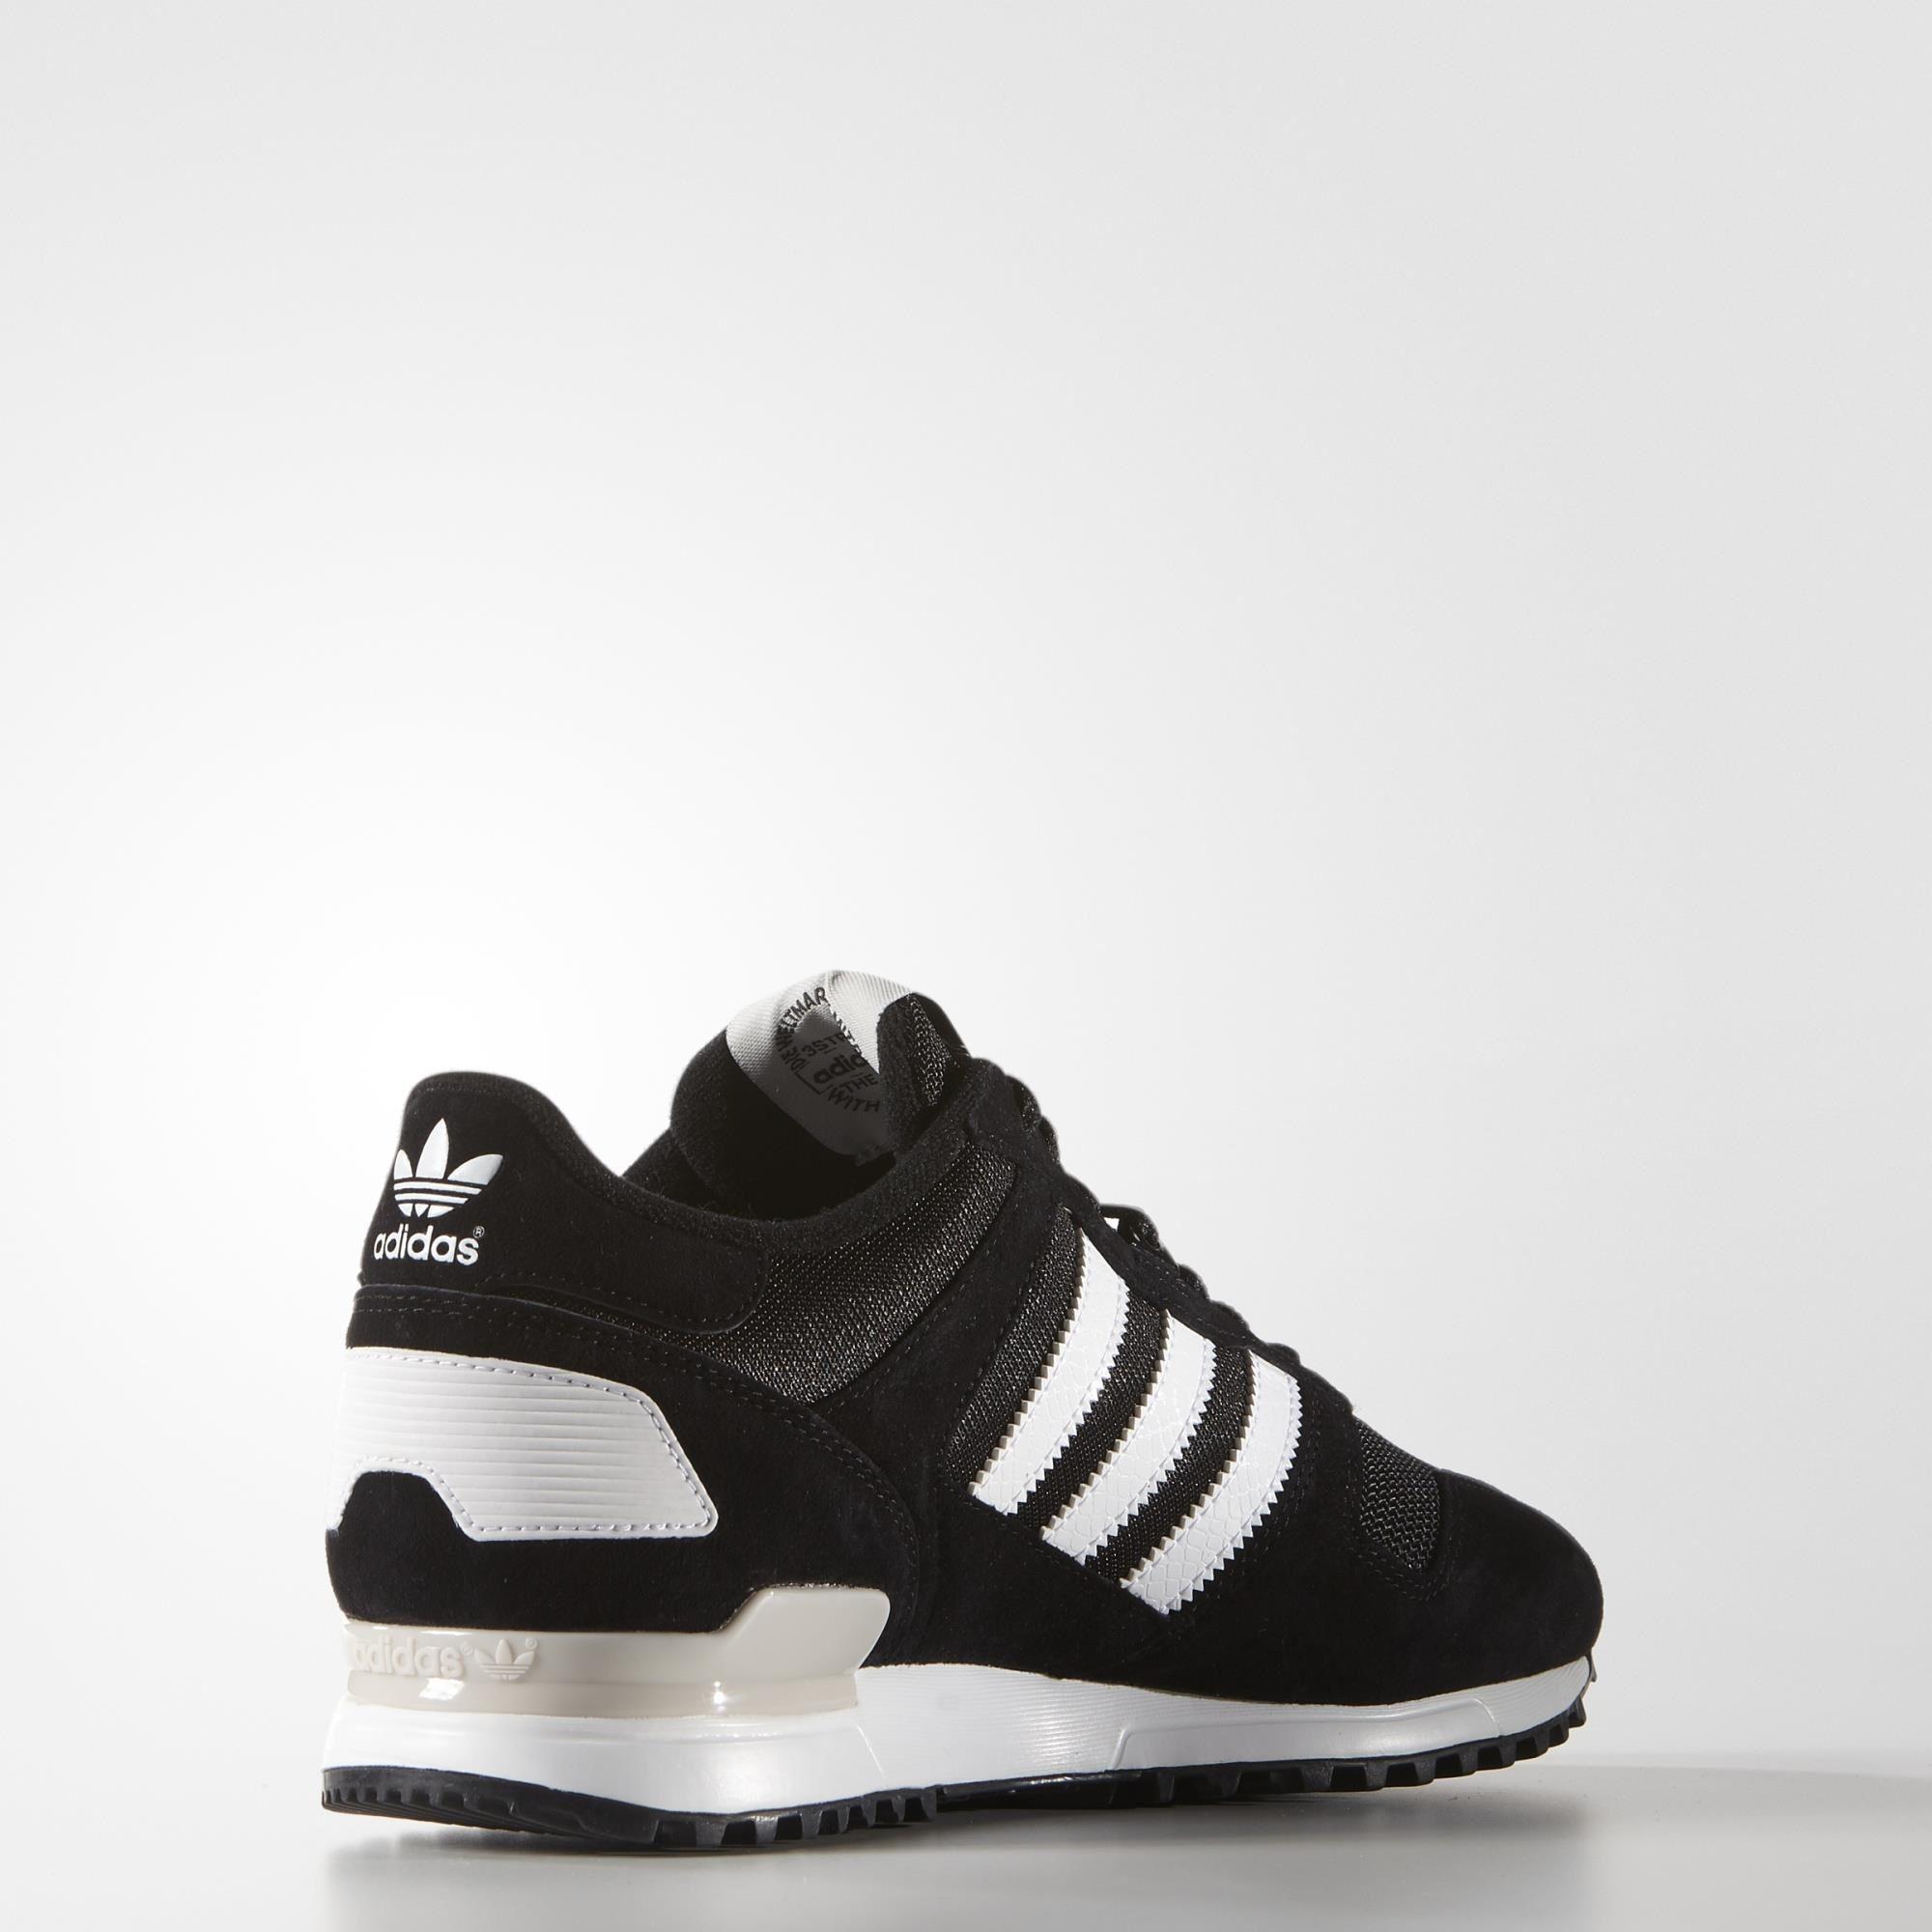 Scarpe Adidas Zx 700 Uomo